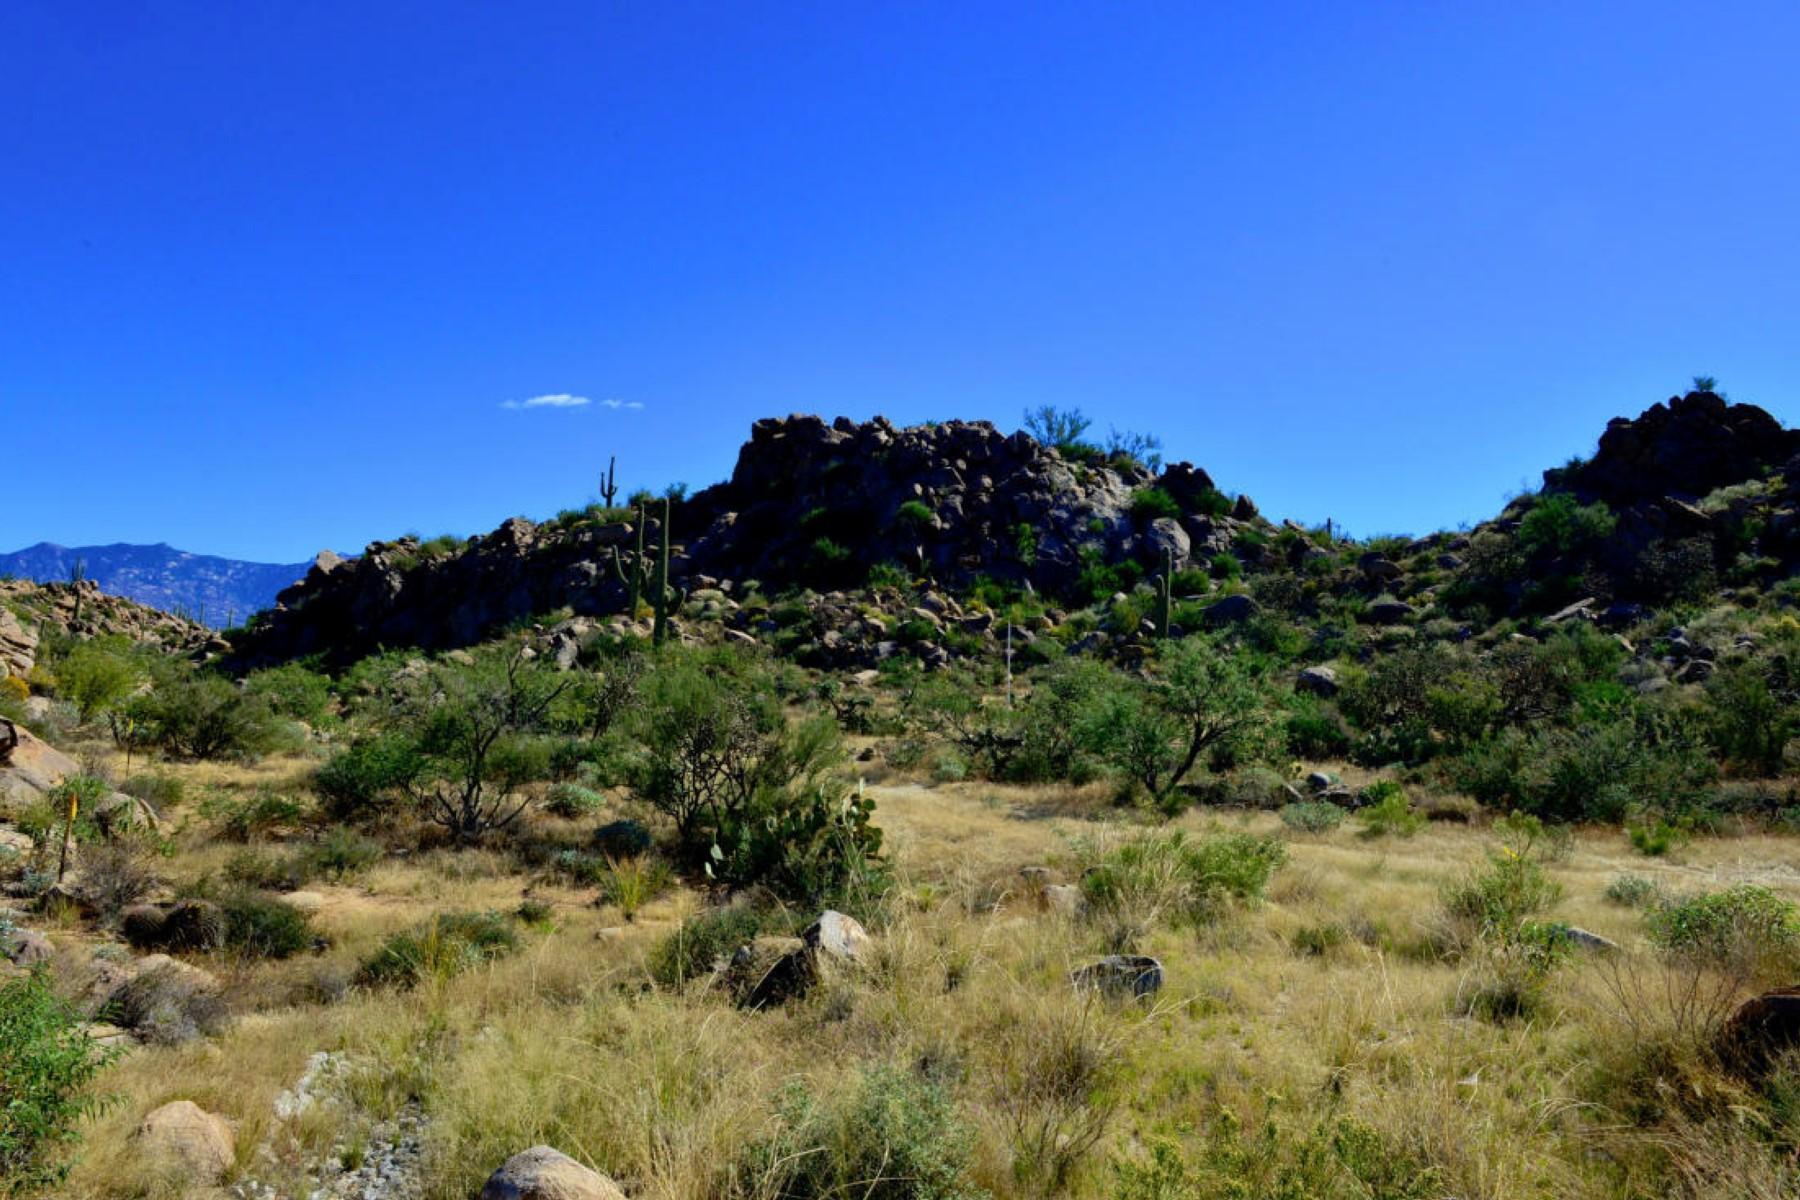 Terreno por un Venta en Lovely Homesite In Phil Mickelson's Stone Canyon Club 863 W Granite Gorge Drive W #328 Oro Valley, Arizona 85755 Estados Unidos